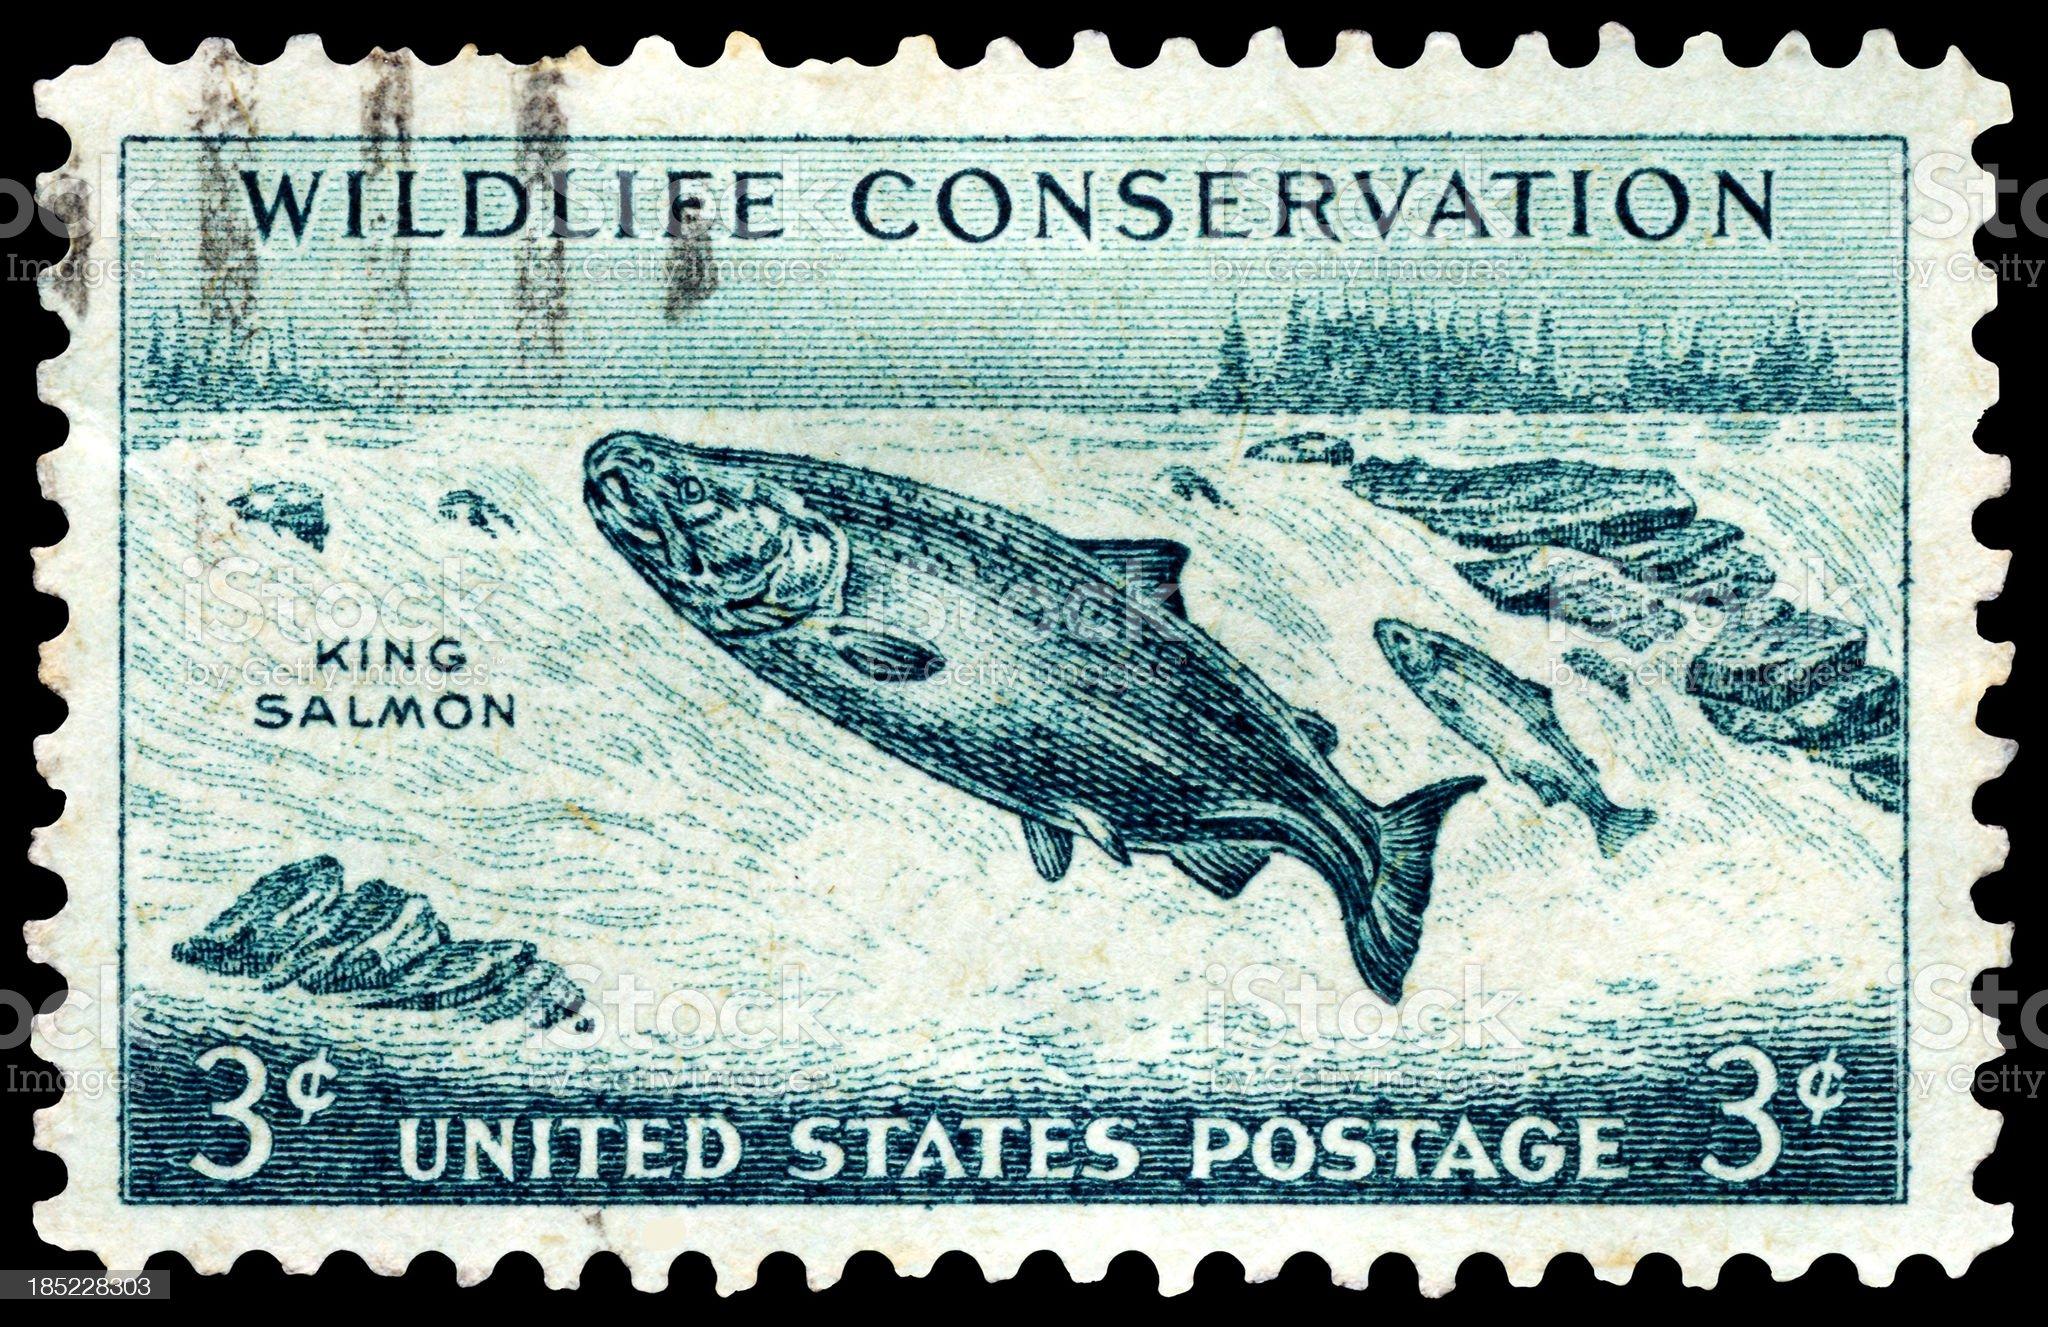 Chinook King Salmon Wildlife Conservation Postage Stamp royalty-free stock photo